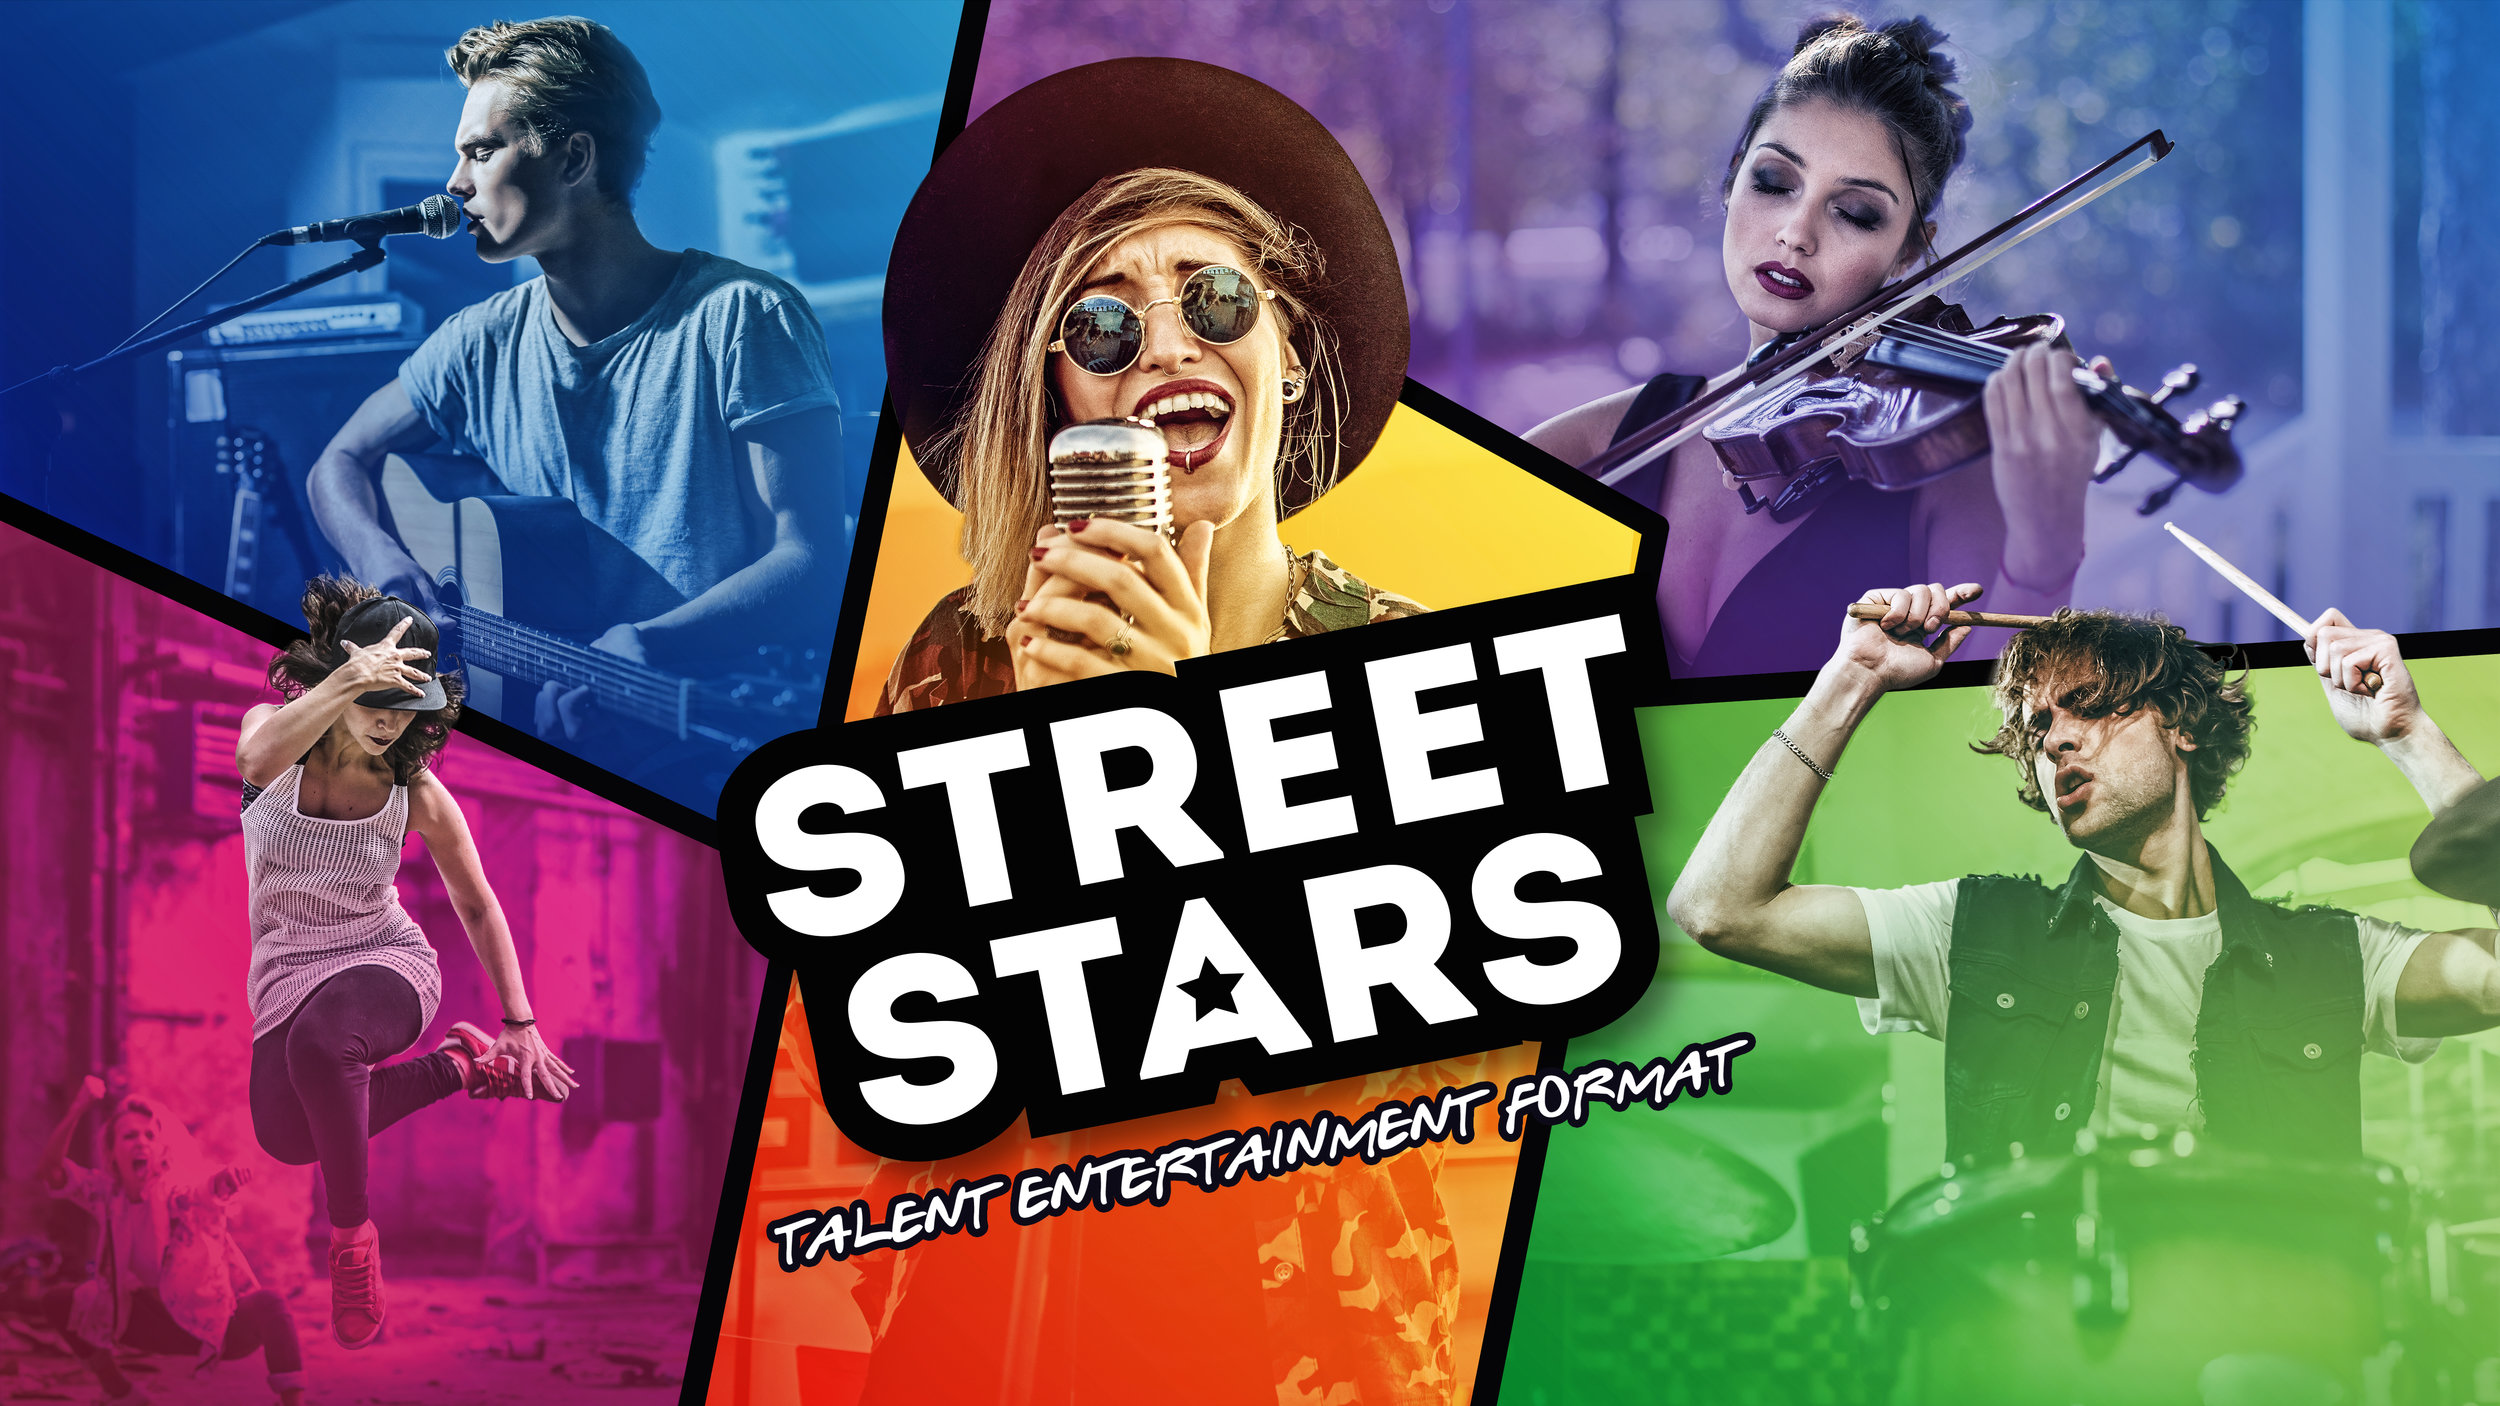 STREET STARS_KEY ART_FINAL.jpg